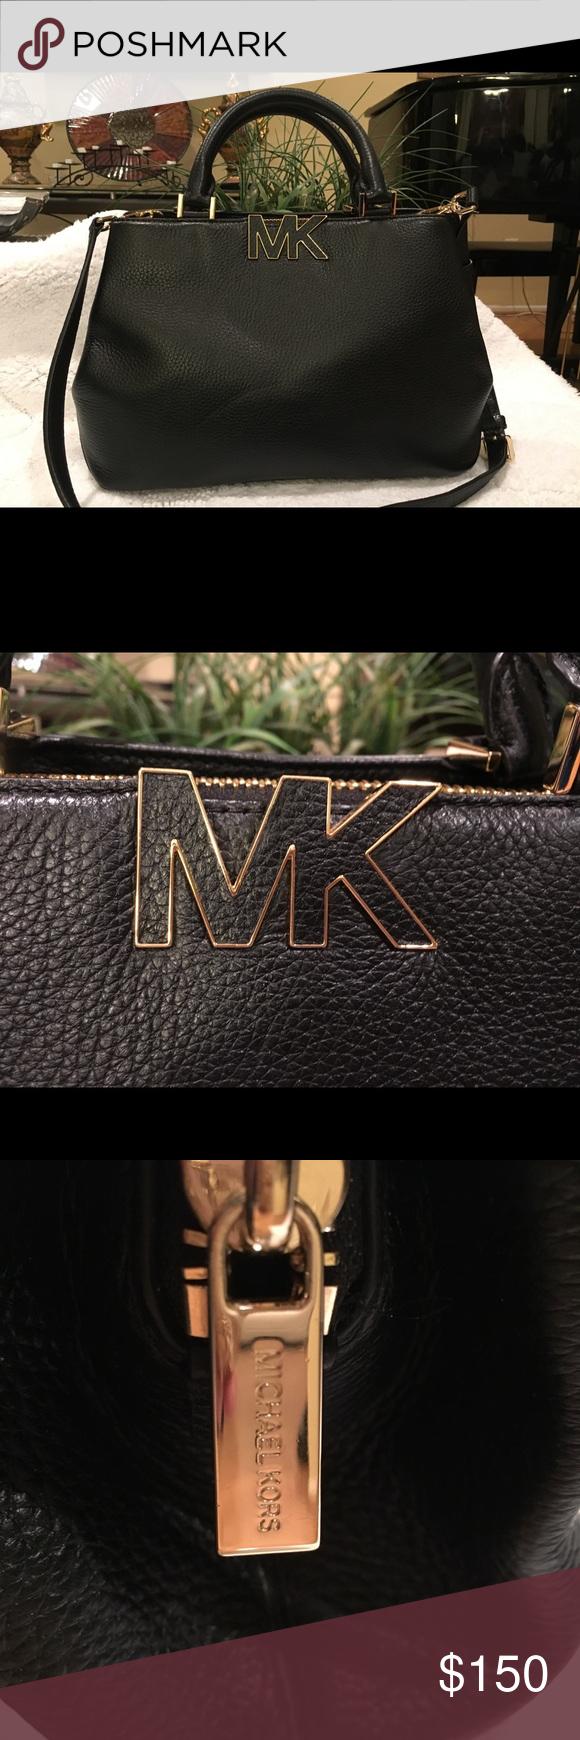 632861f37ac7 Michael Kors 'Florence' bag Brand New with Tags Michael Kors black satchel.  Carries